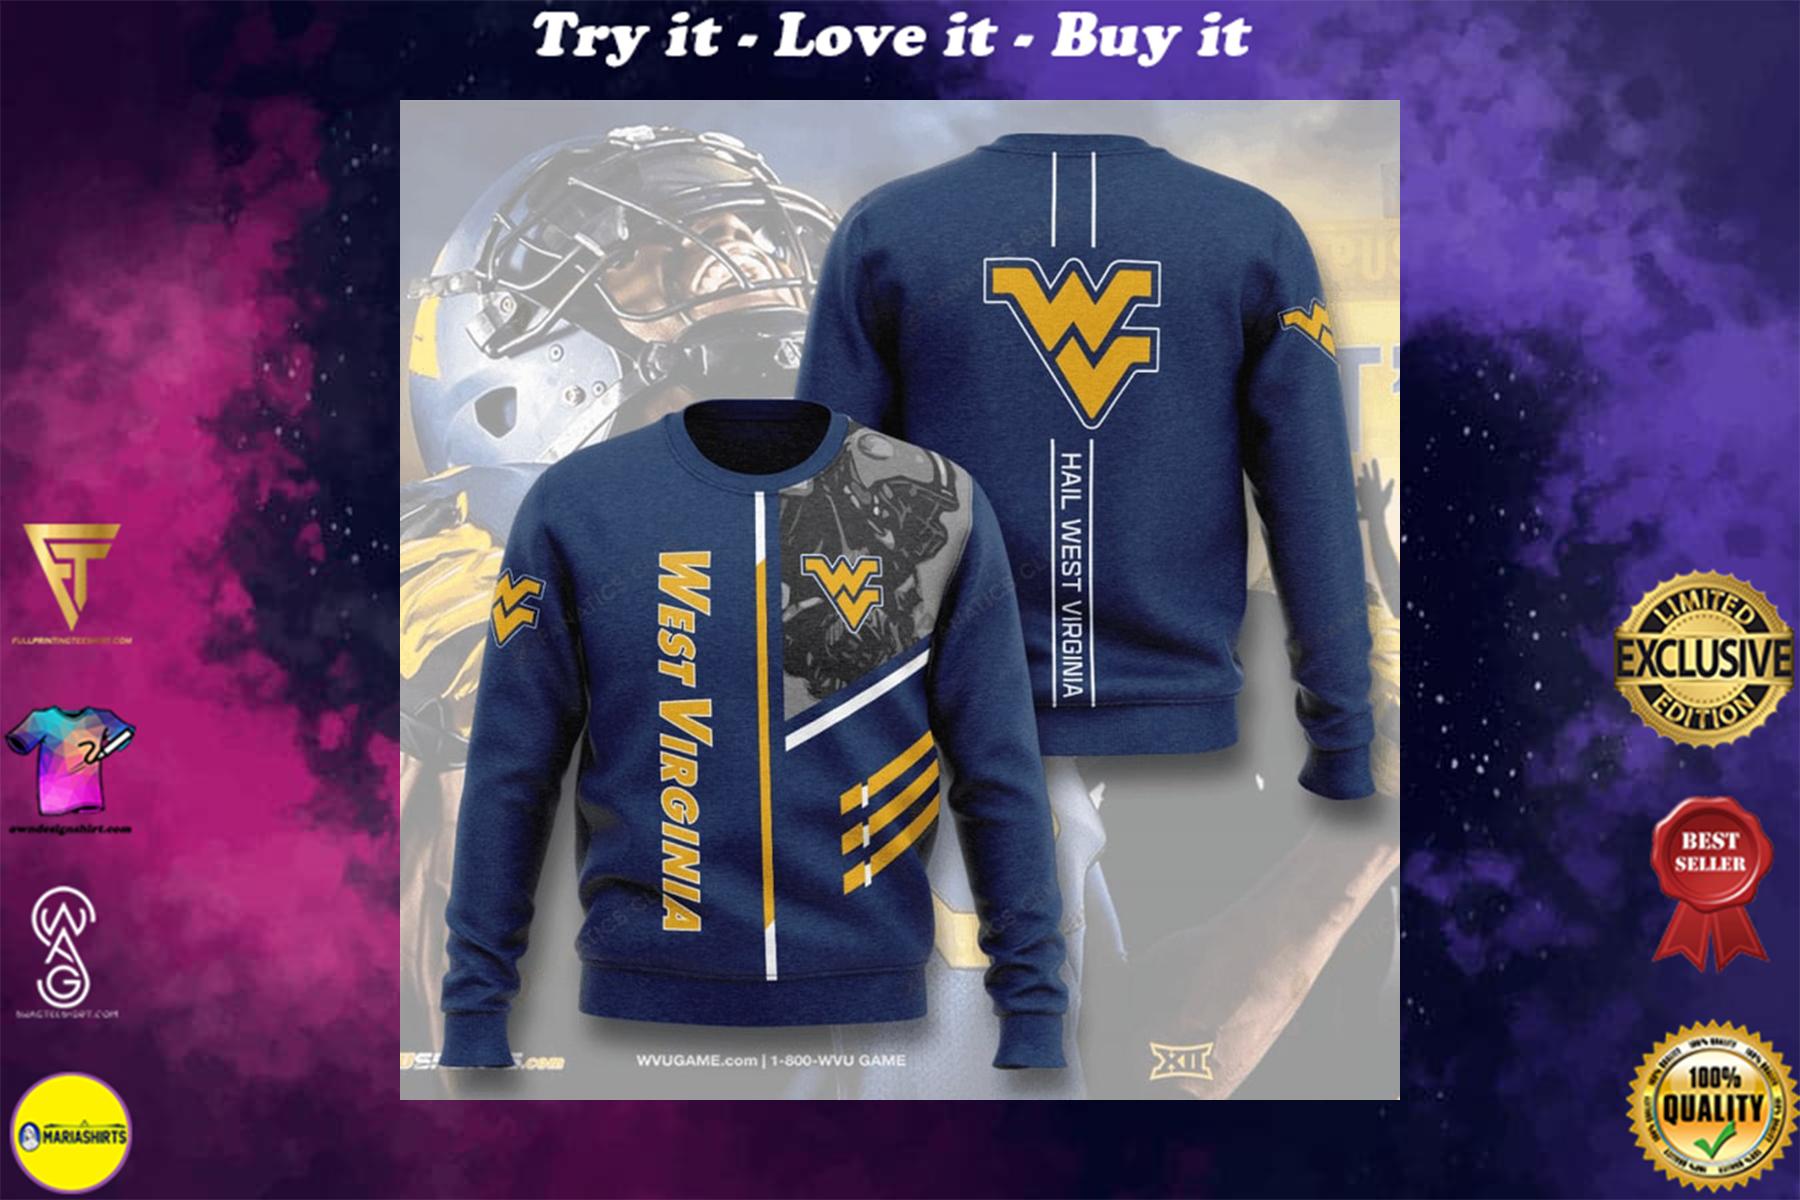 west virginia mountaineers football hail west virginia full printing ugly sweater